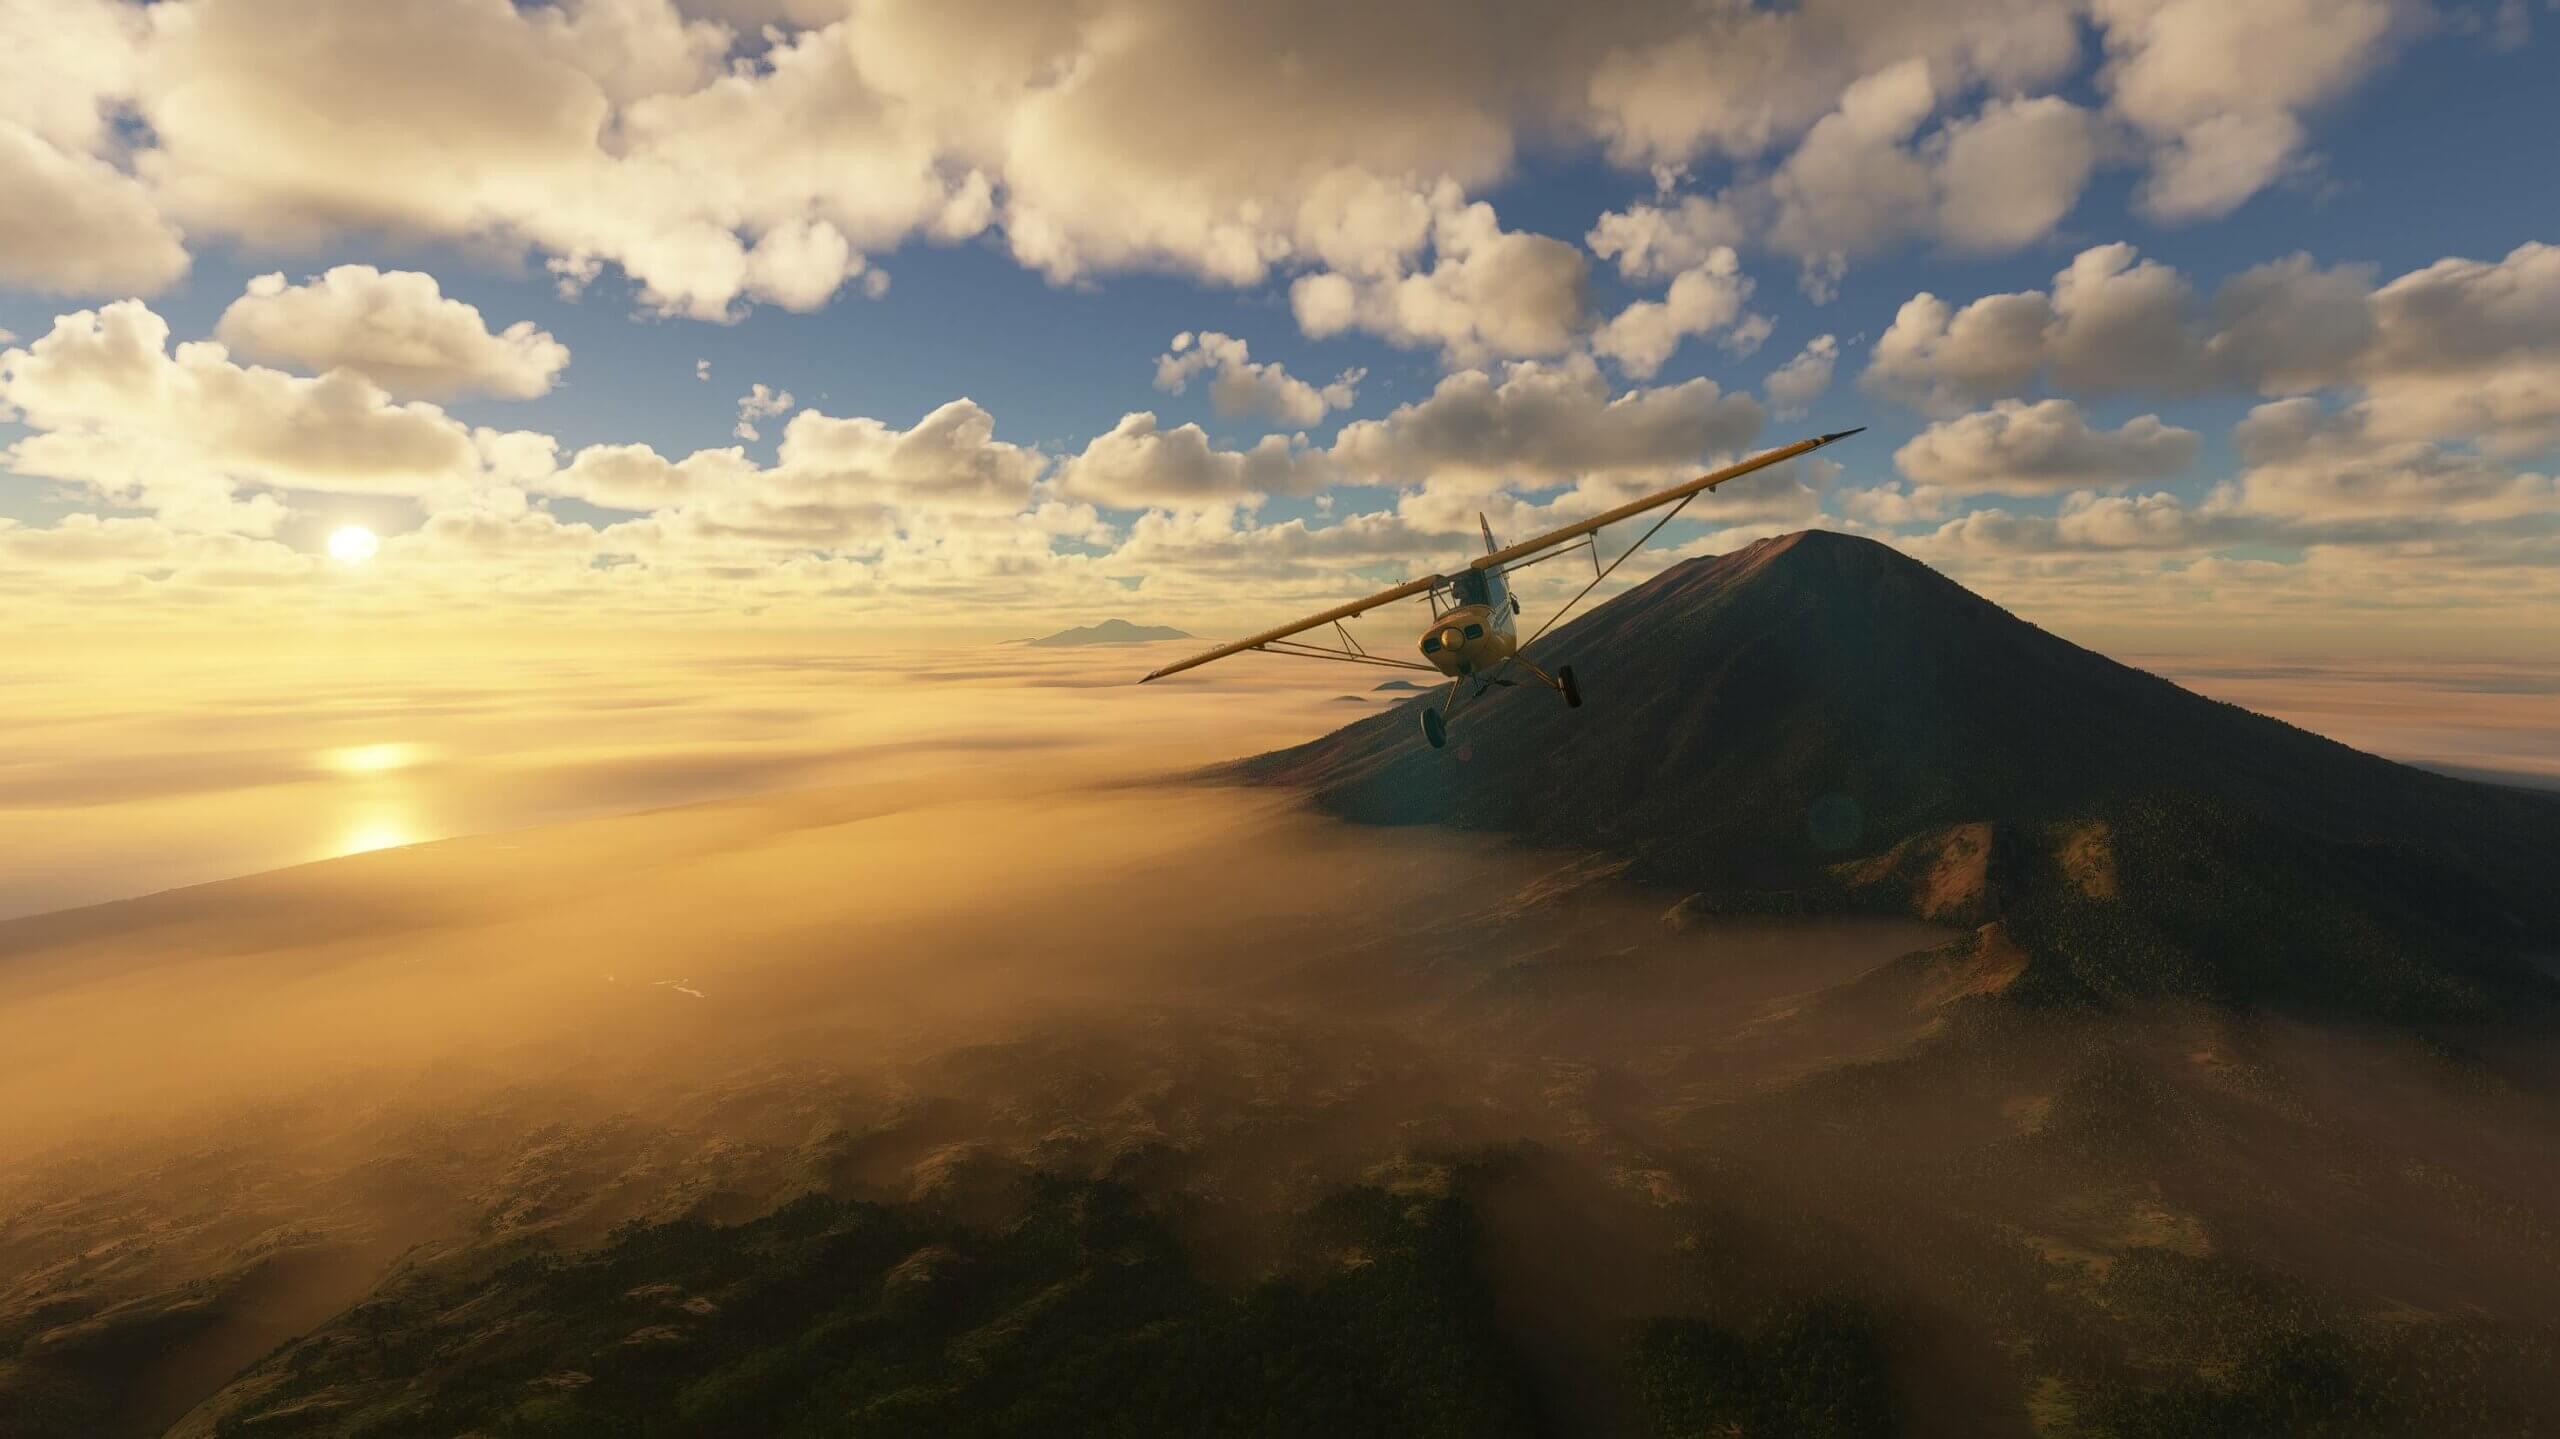 Bali-Batur-Screenshot-by-Jannik207-scale